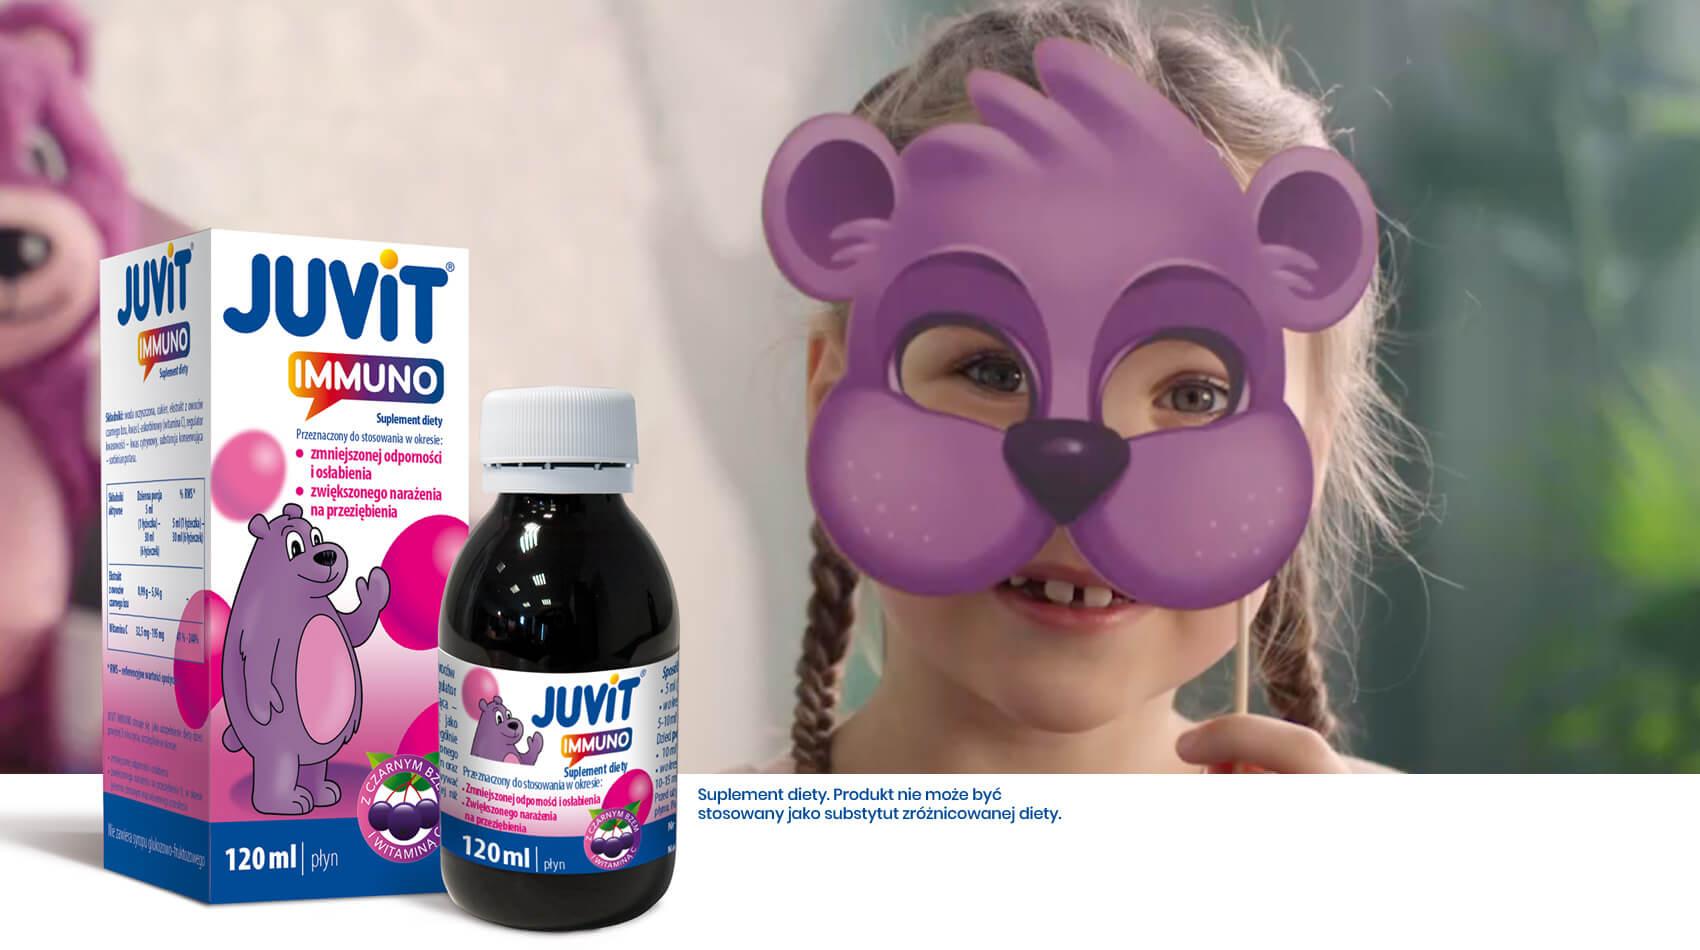 Juvit Immuno